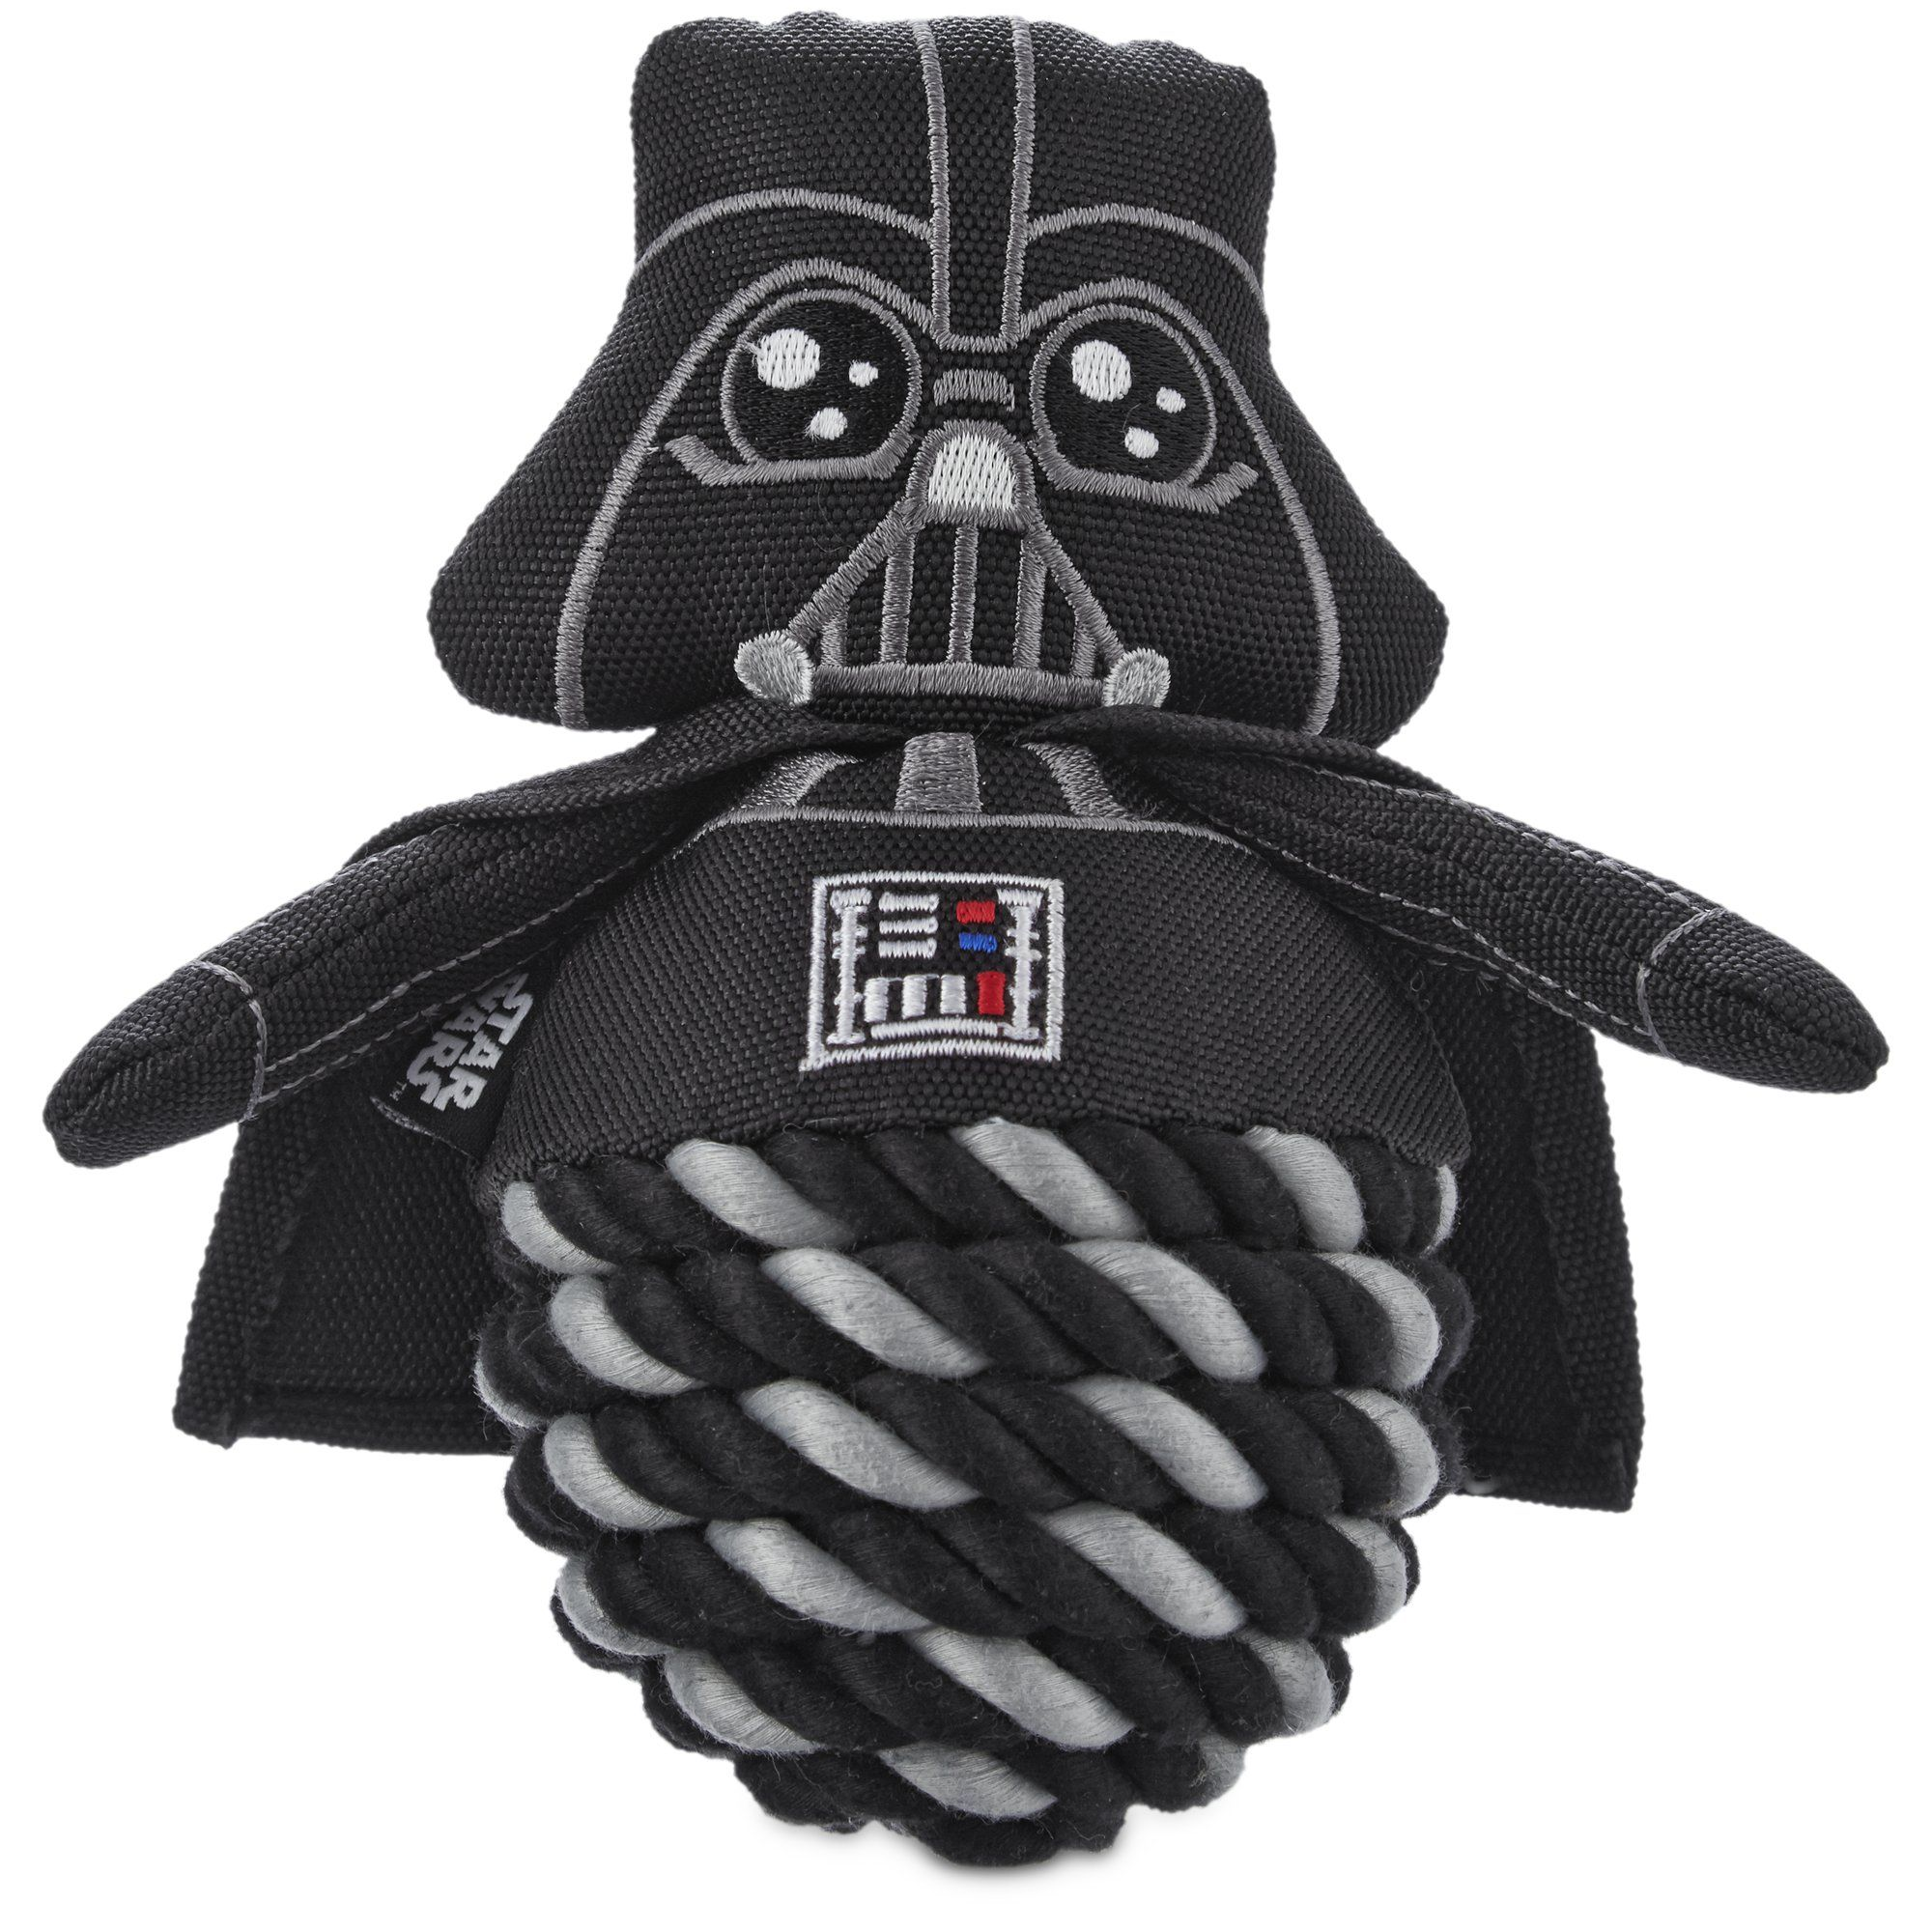 8 Star Wars Darth Vader Rope Ball Dog Toy 6 Star Wars Darth